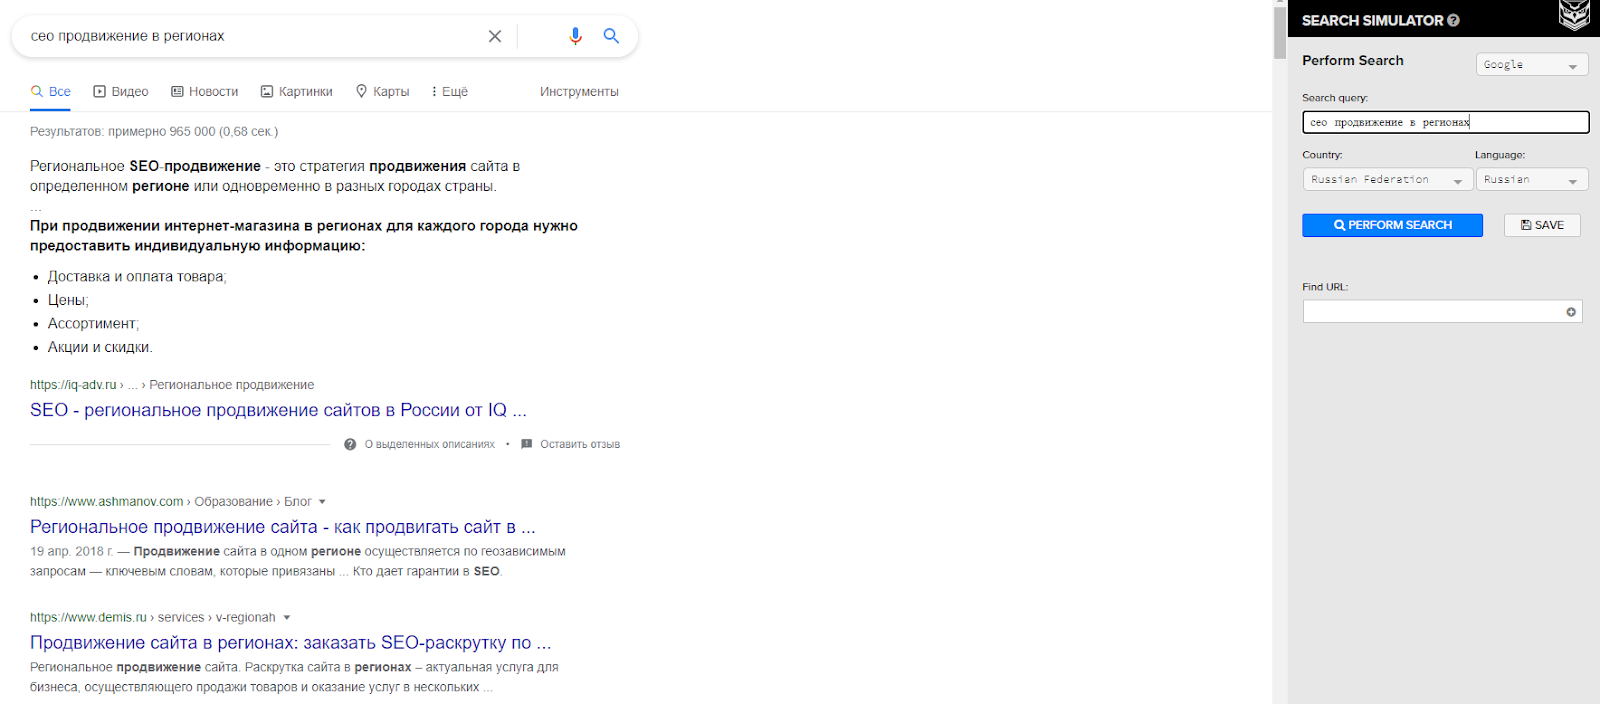 SEO Search Simulator результат